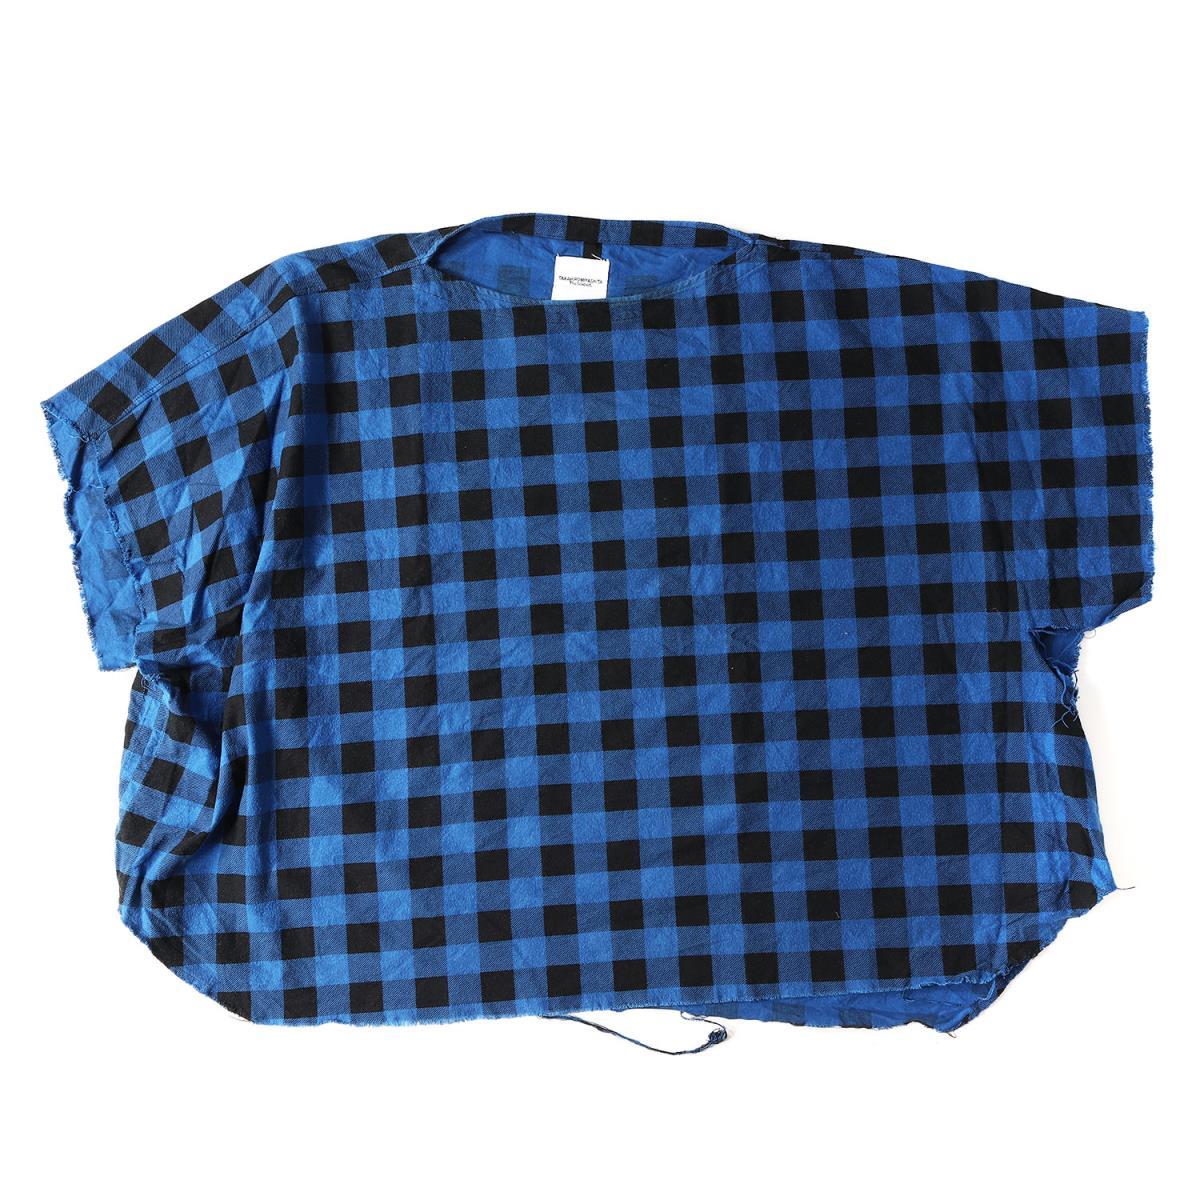 The SoloIst. (ザ ソロイスト) 15S/S ブロックチェックネルポンチョシャツ(sg.0259 Poncho Shirt) ブルー 46 【メンズ】【K2079】【中古】【あす楽☆対応可】